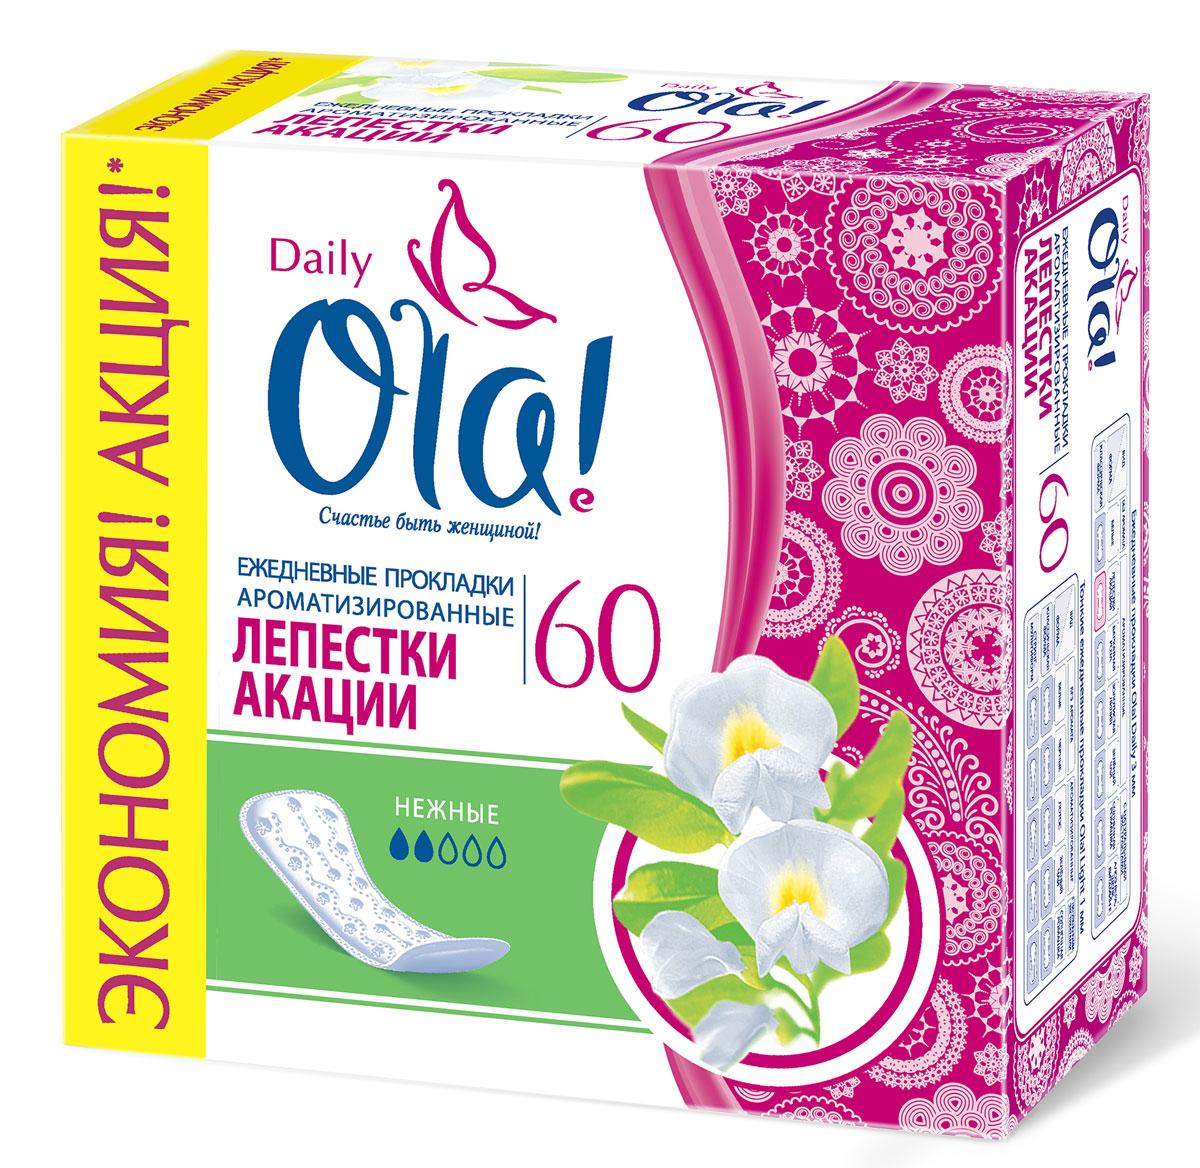 Ola! Daily DEO (Лепестки акации) Прокладки, 60 шт